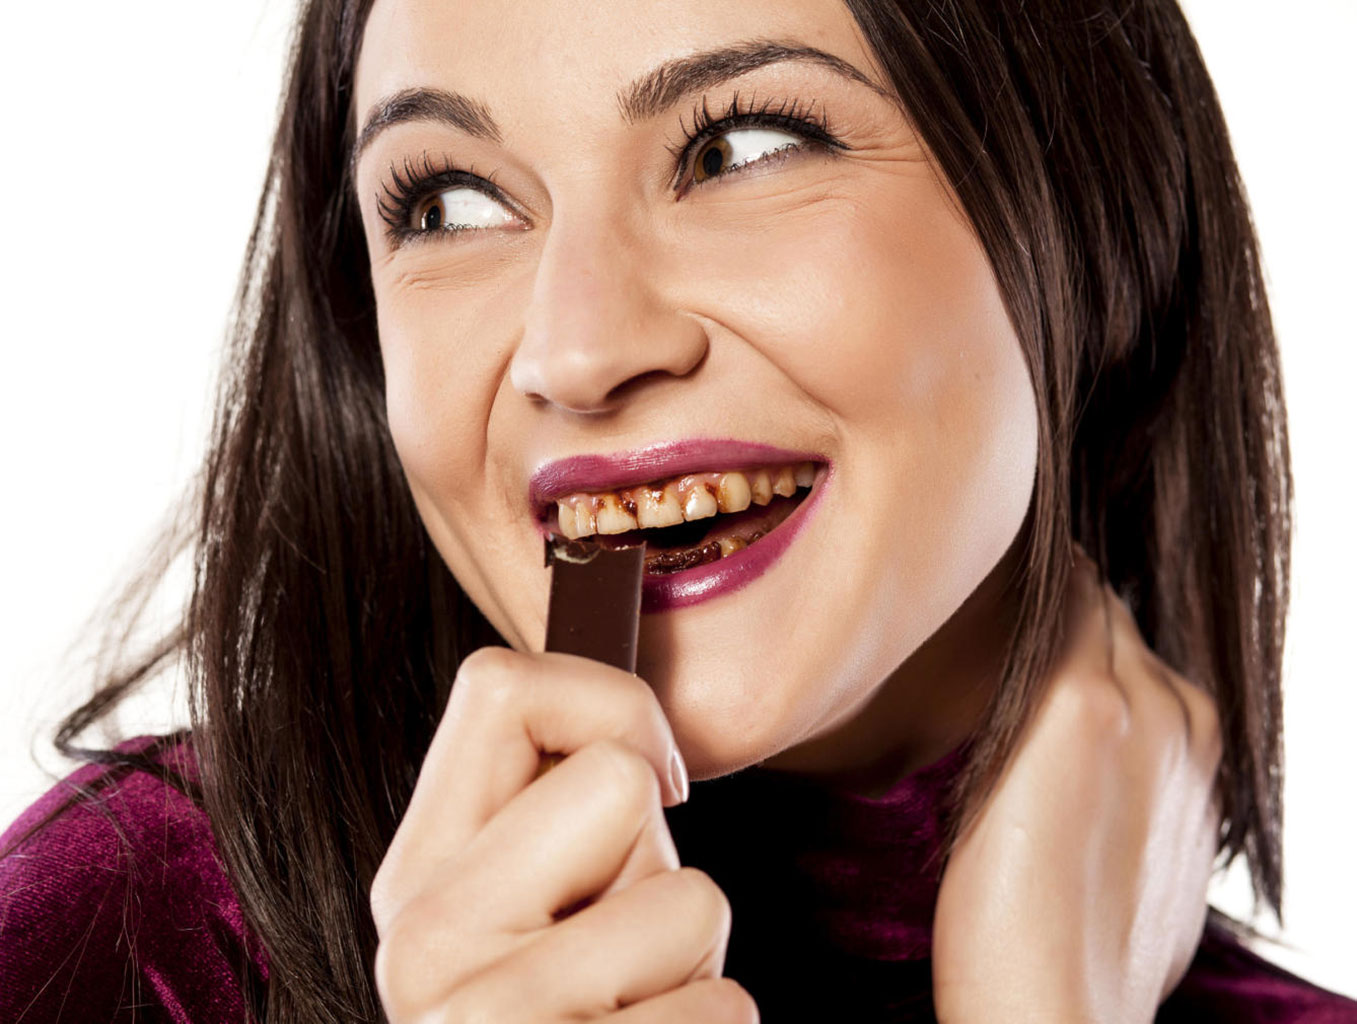 Вред шоколада для зубов матери